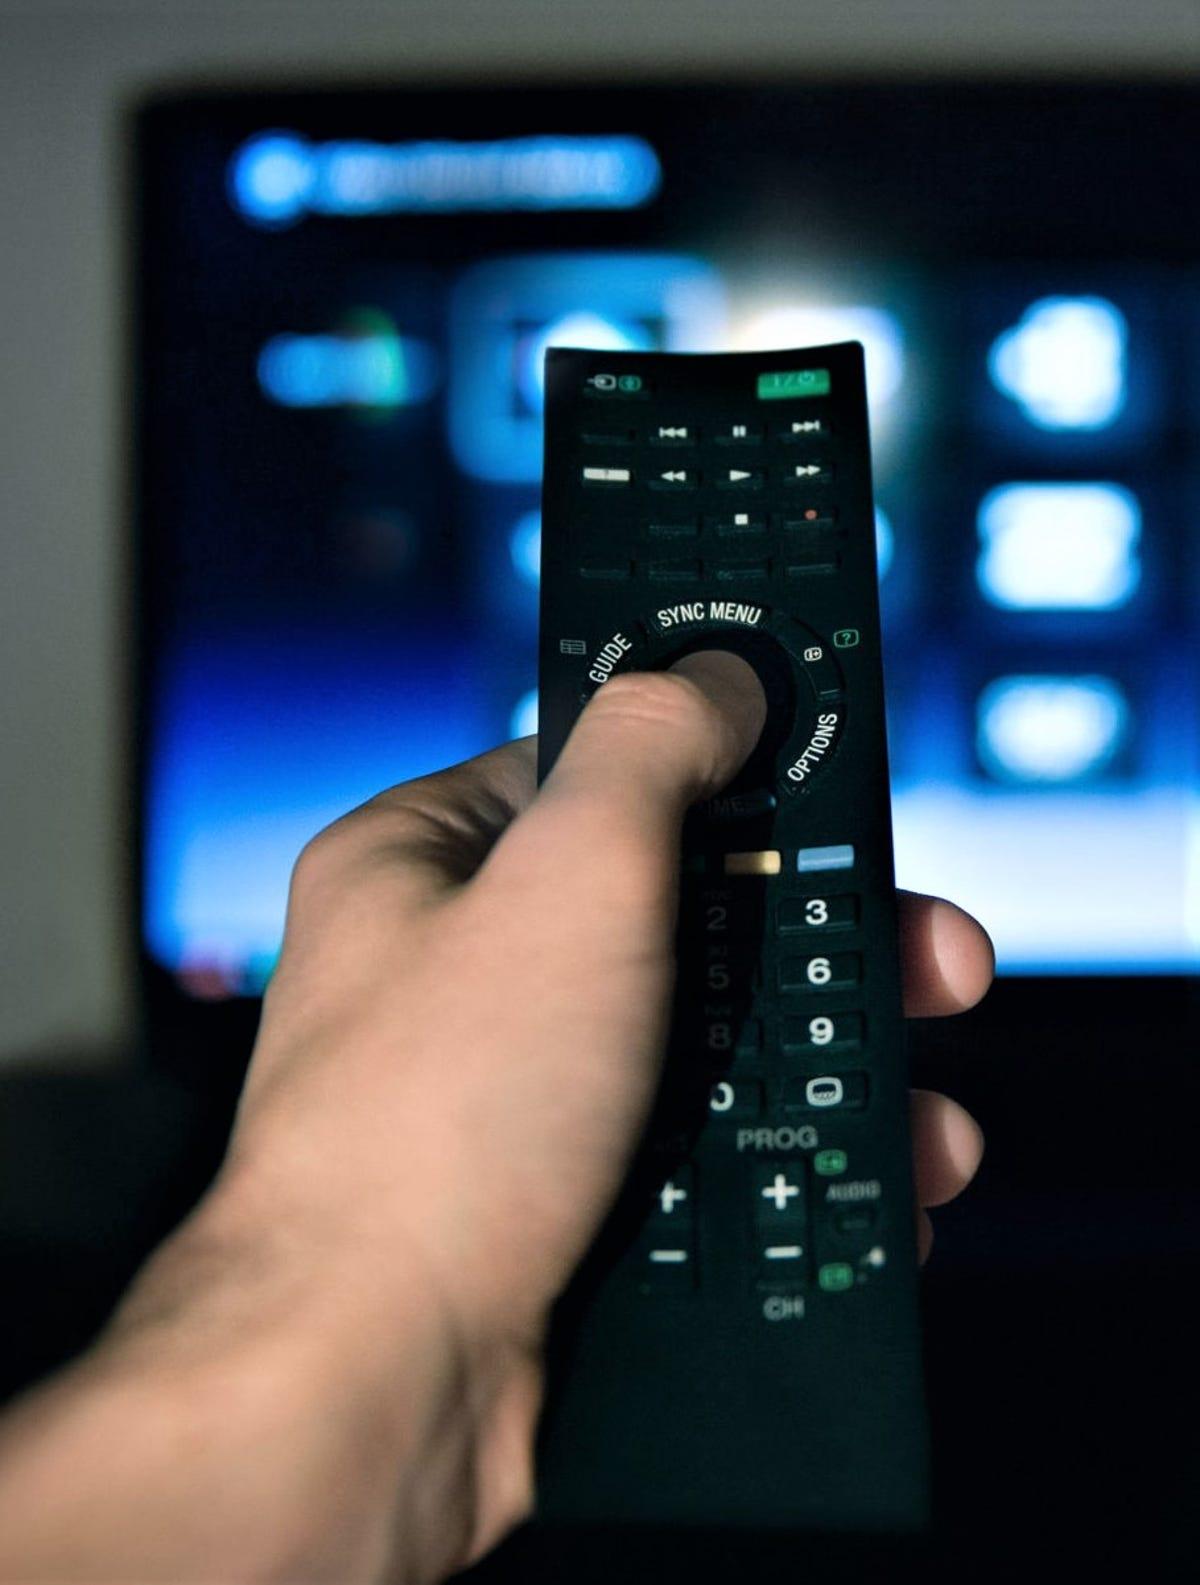 AT&T-Nexstar dispute: DirecTV, U-verse subscribers still in